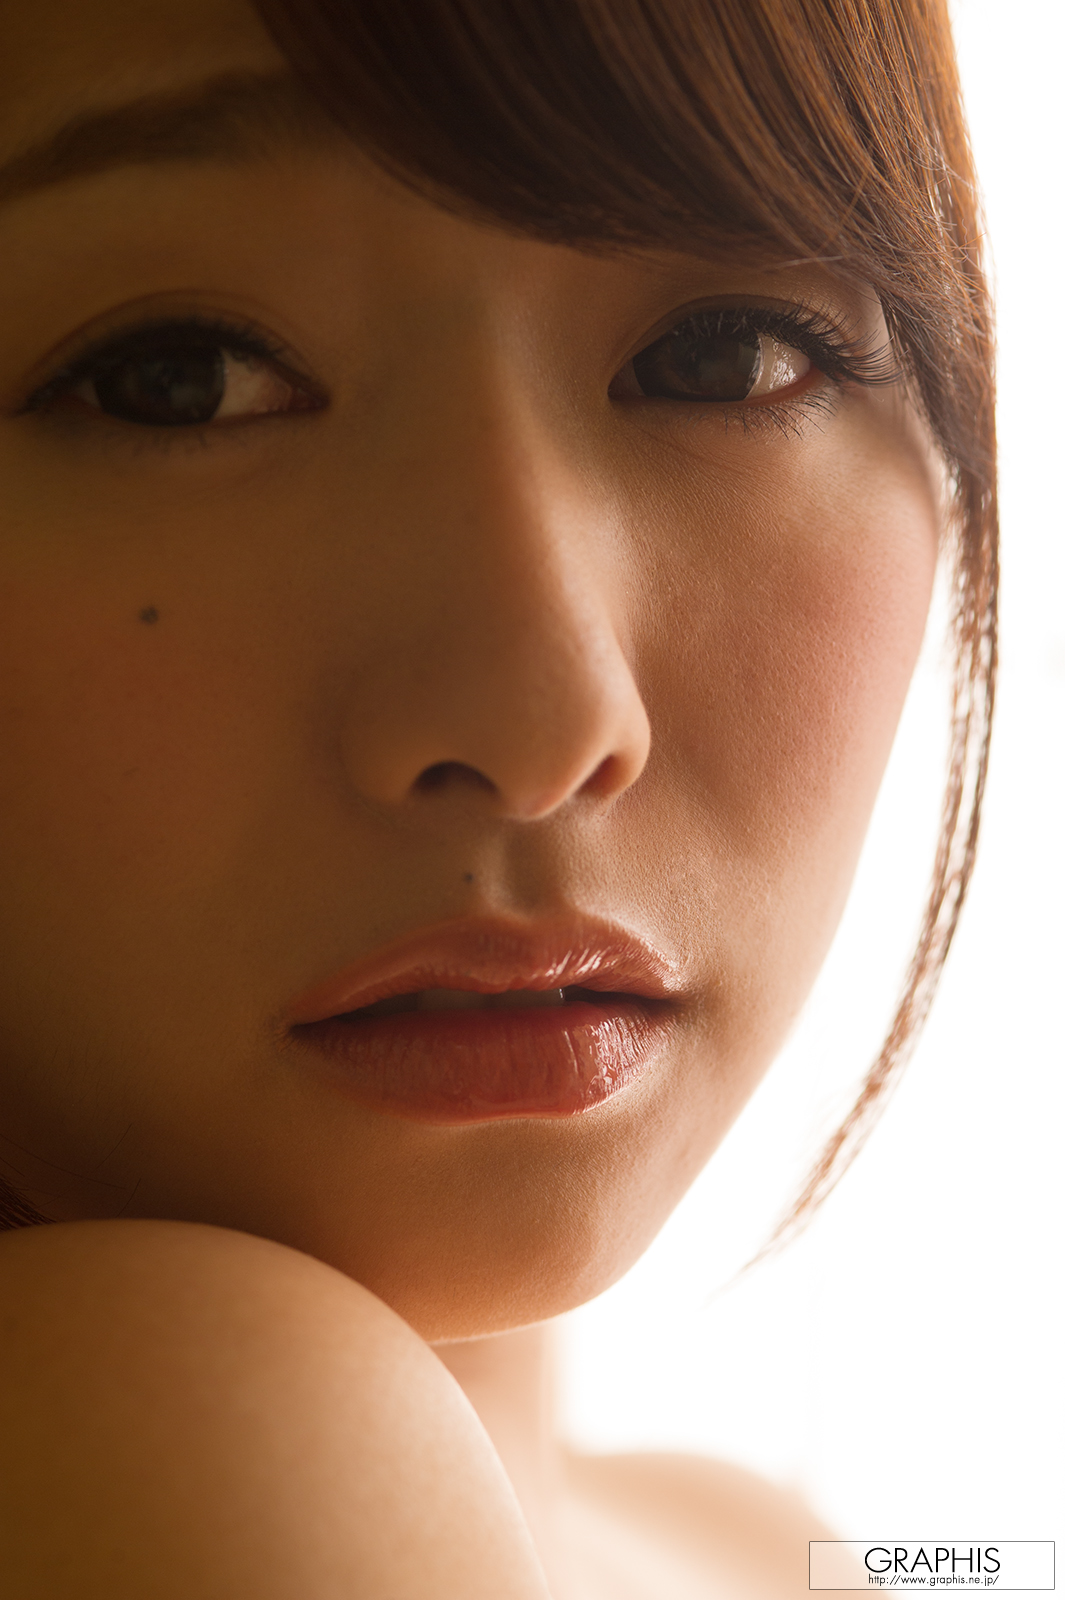 marina-shiraishi-red-kimono-boobs-naked-asian-graphis-21